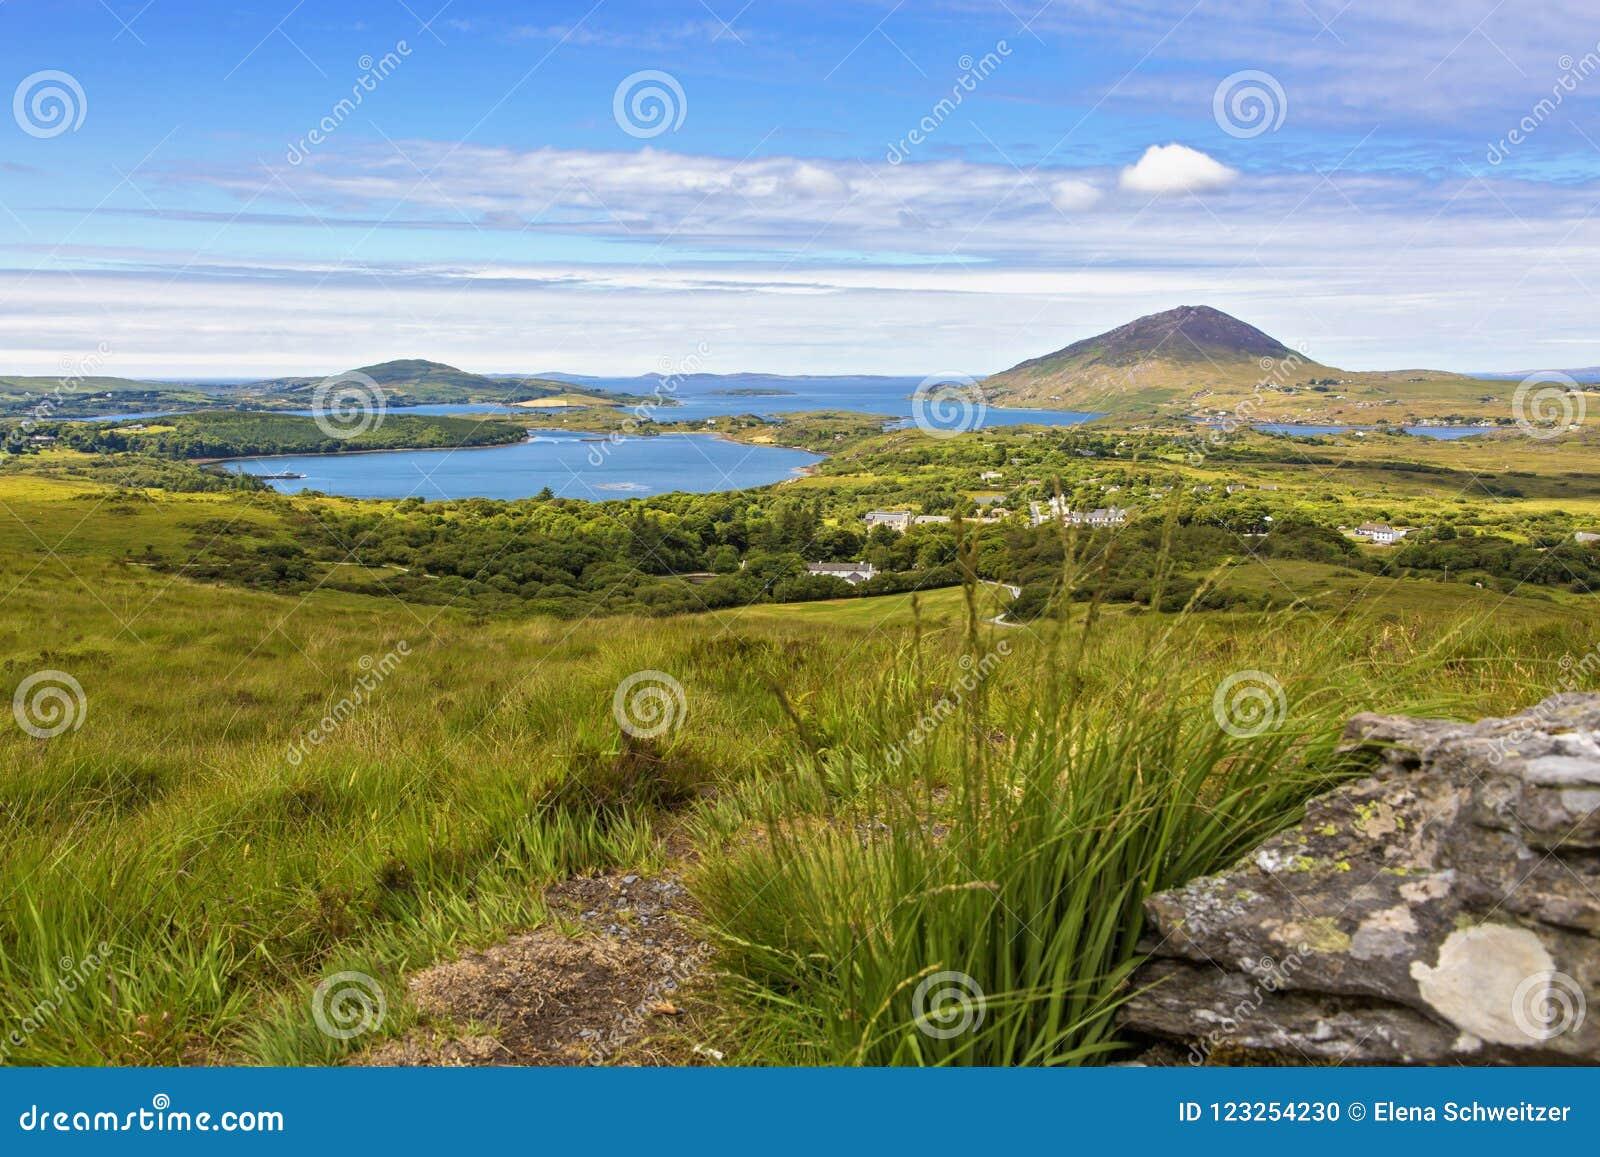 Download Connemara National Park stock photo. Image of ocean - 123254230